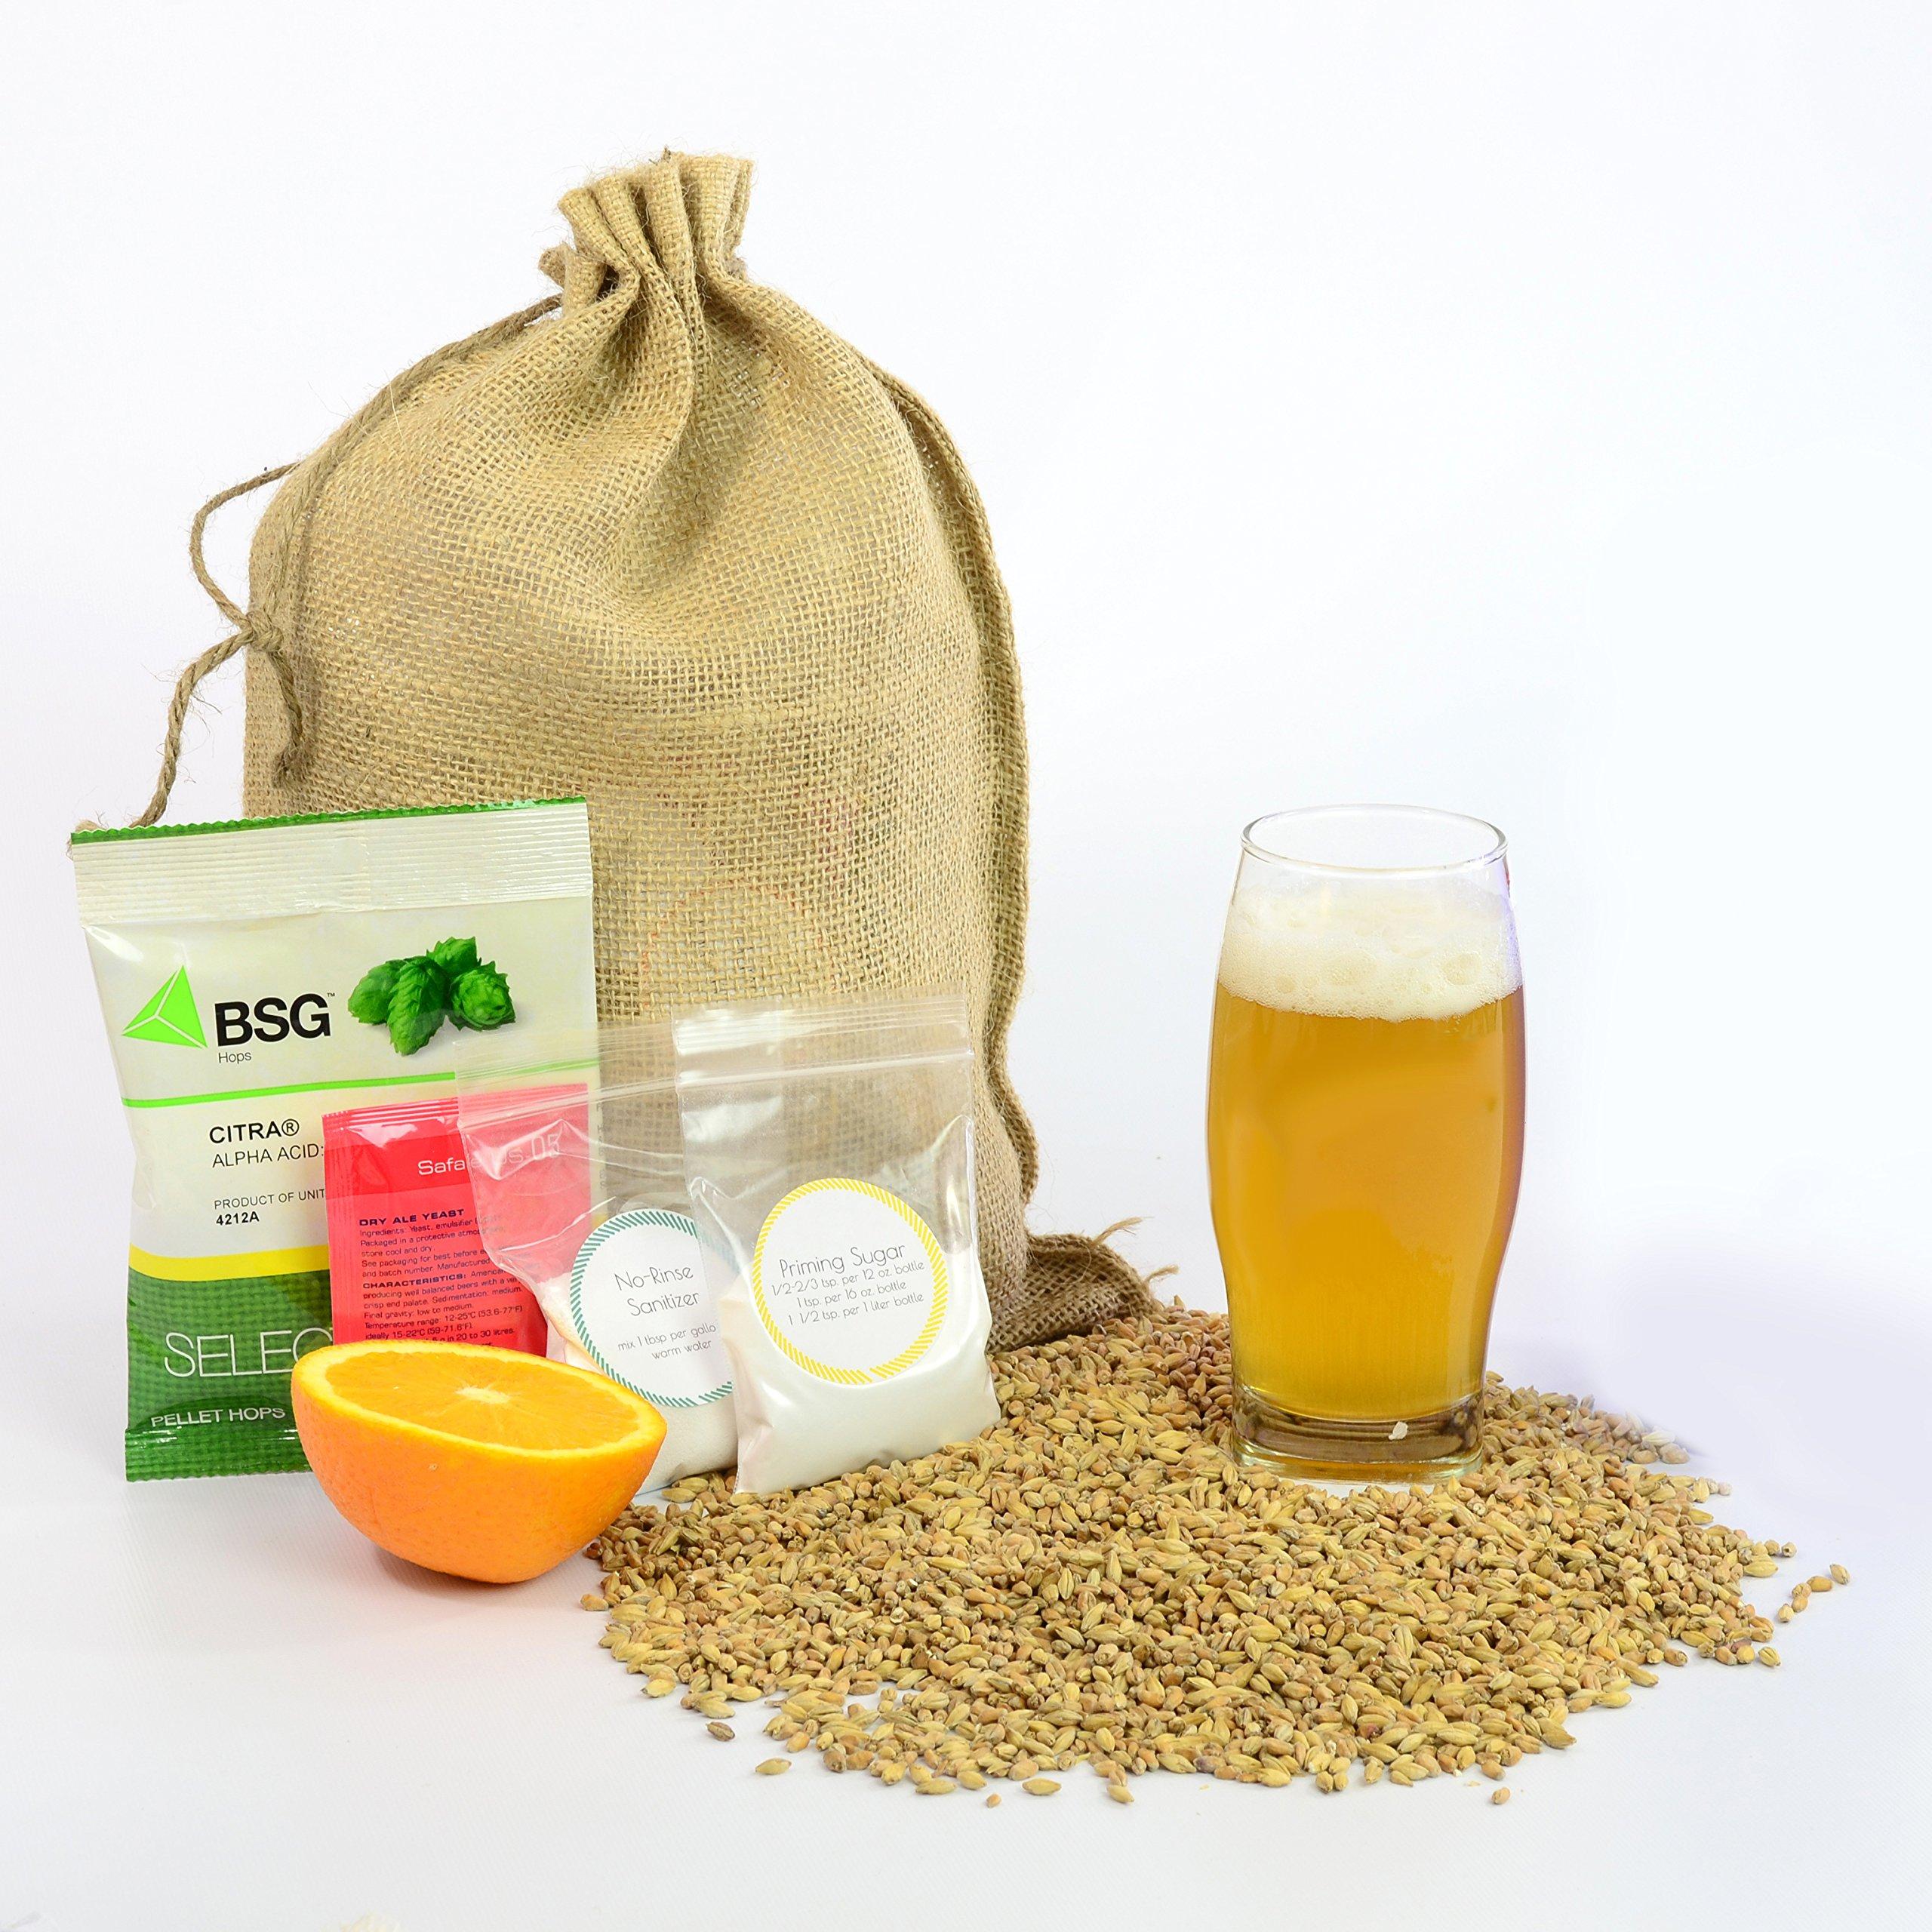 1 Gallon Home Brewing Homebrew Recipe Kit, Tropic Thunder Citra IPA, 5.4%